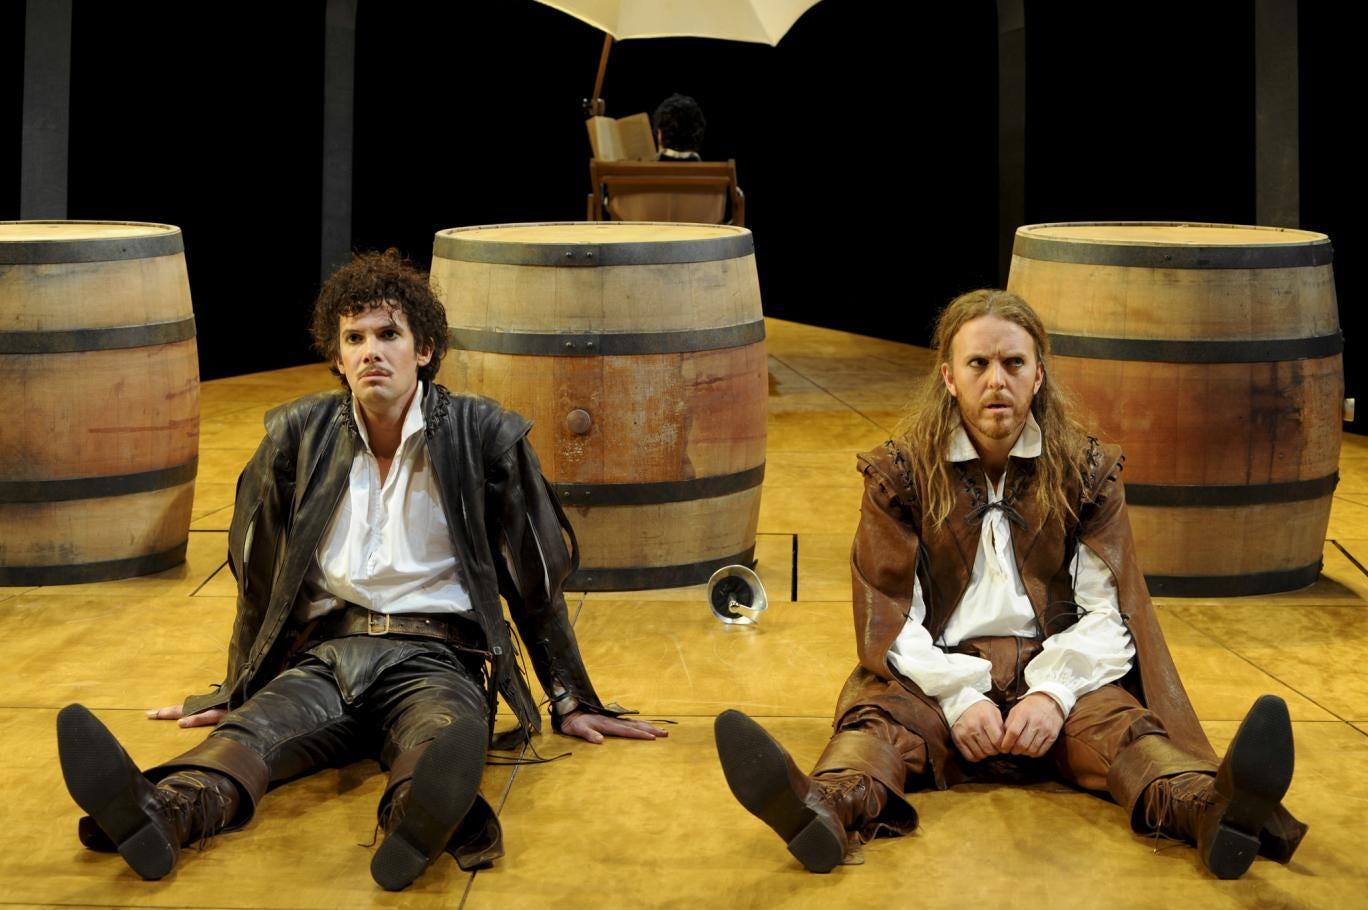 Toby Schmitz and Tim Minchin in Rosencrantz and Guildenstern are Dead